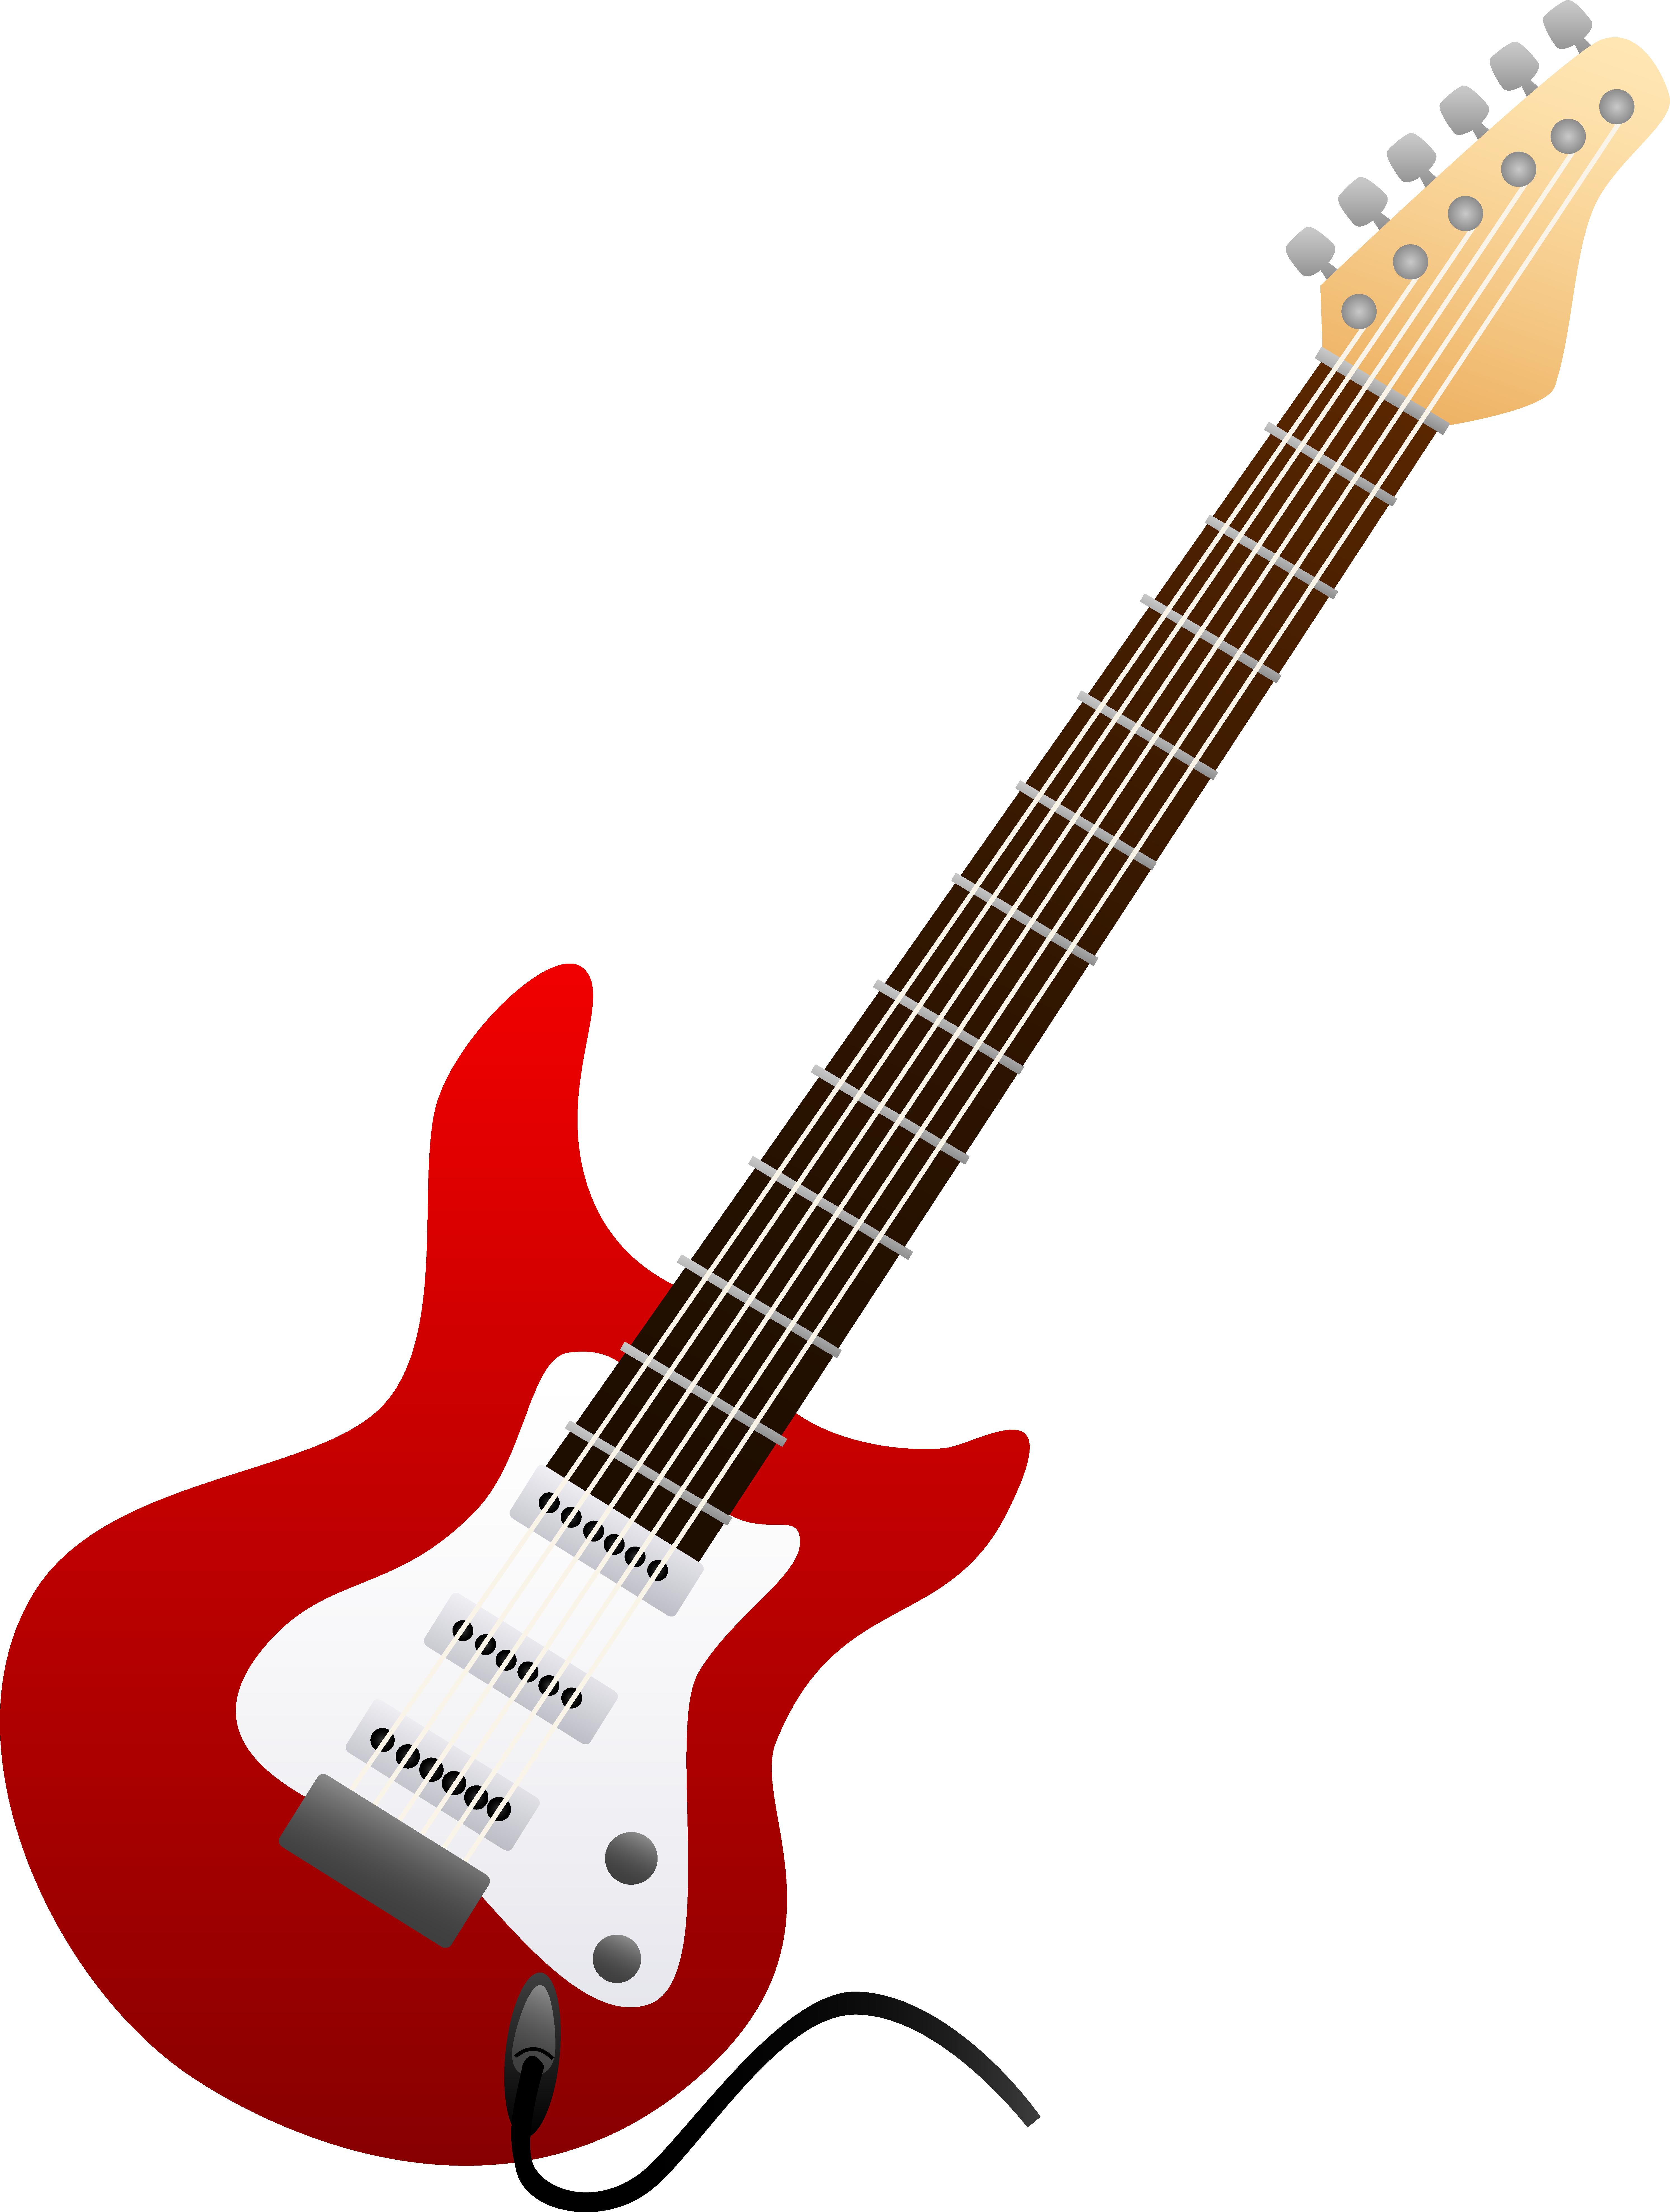 Bass vector panda free. Clipart guitar concert